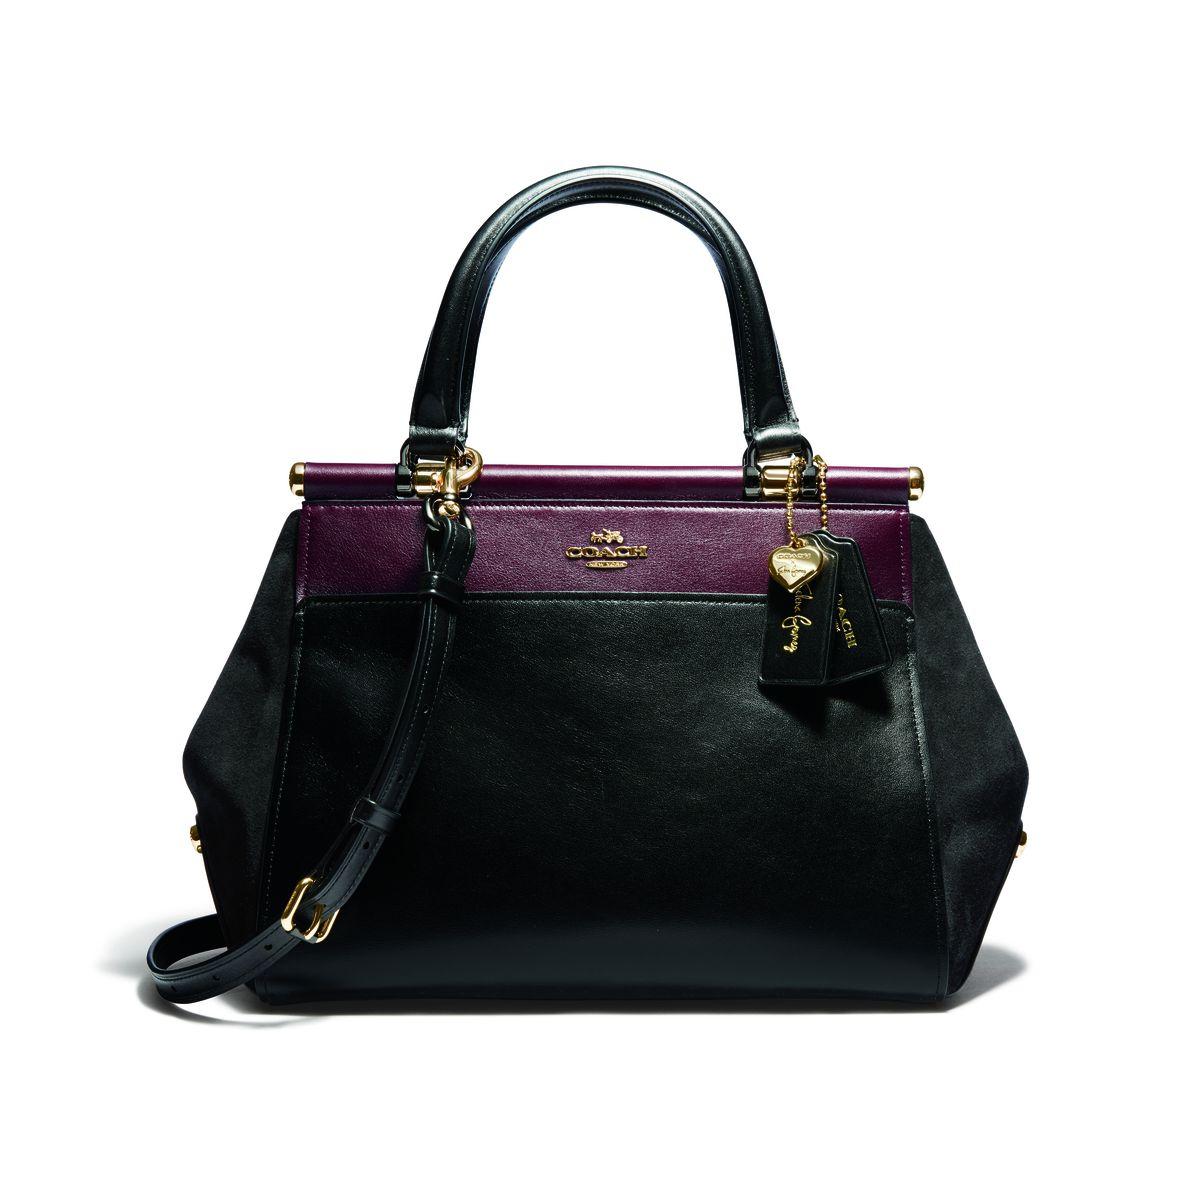 Selena Gomez's Selena Grace bag for Coach